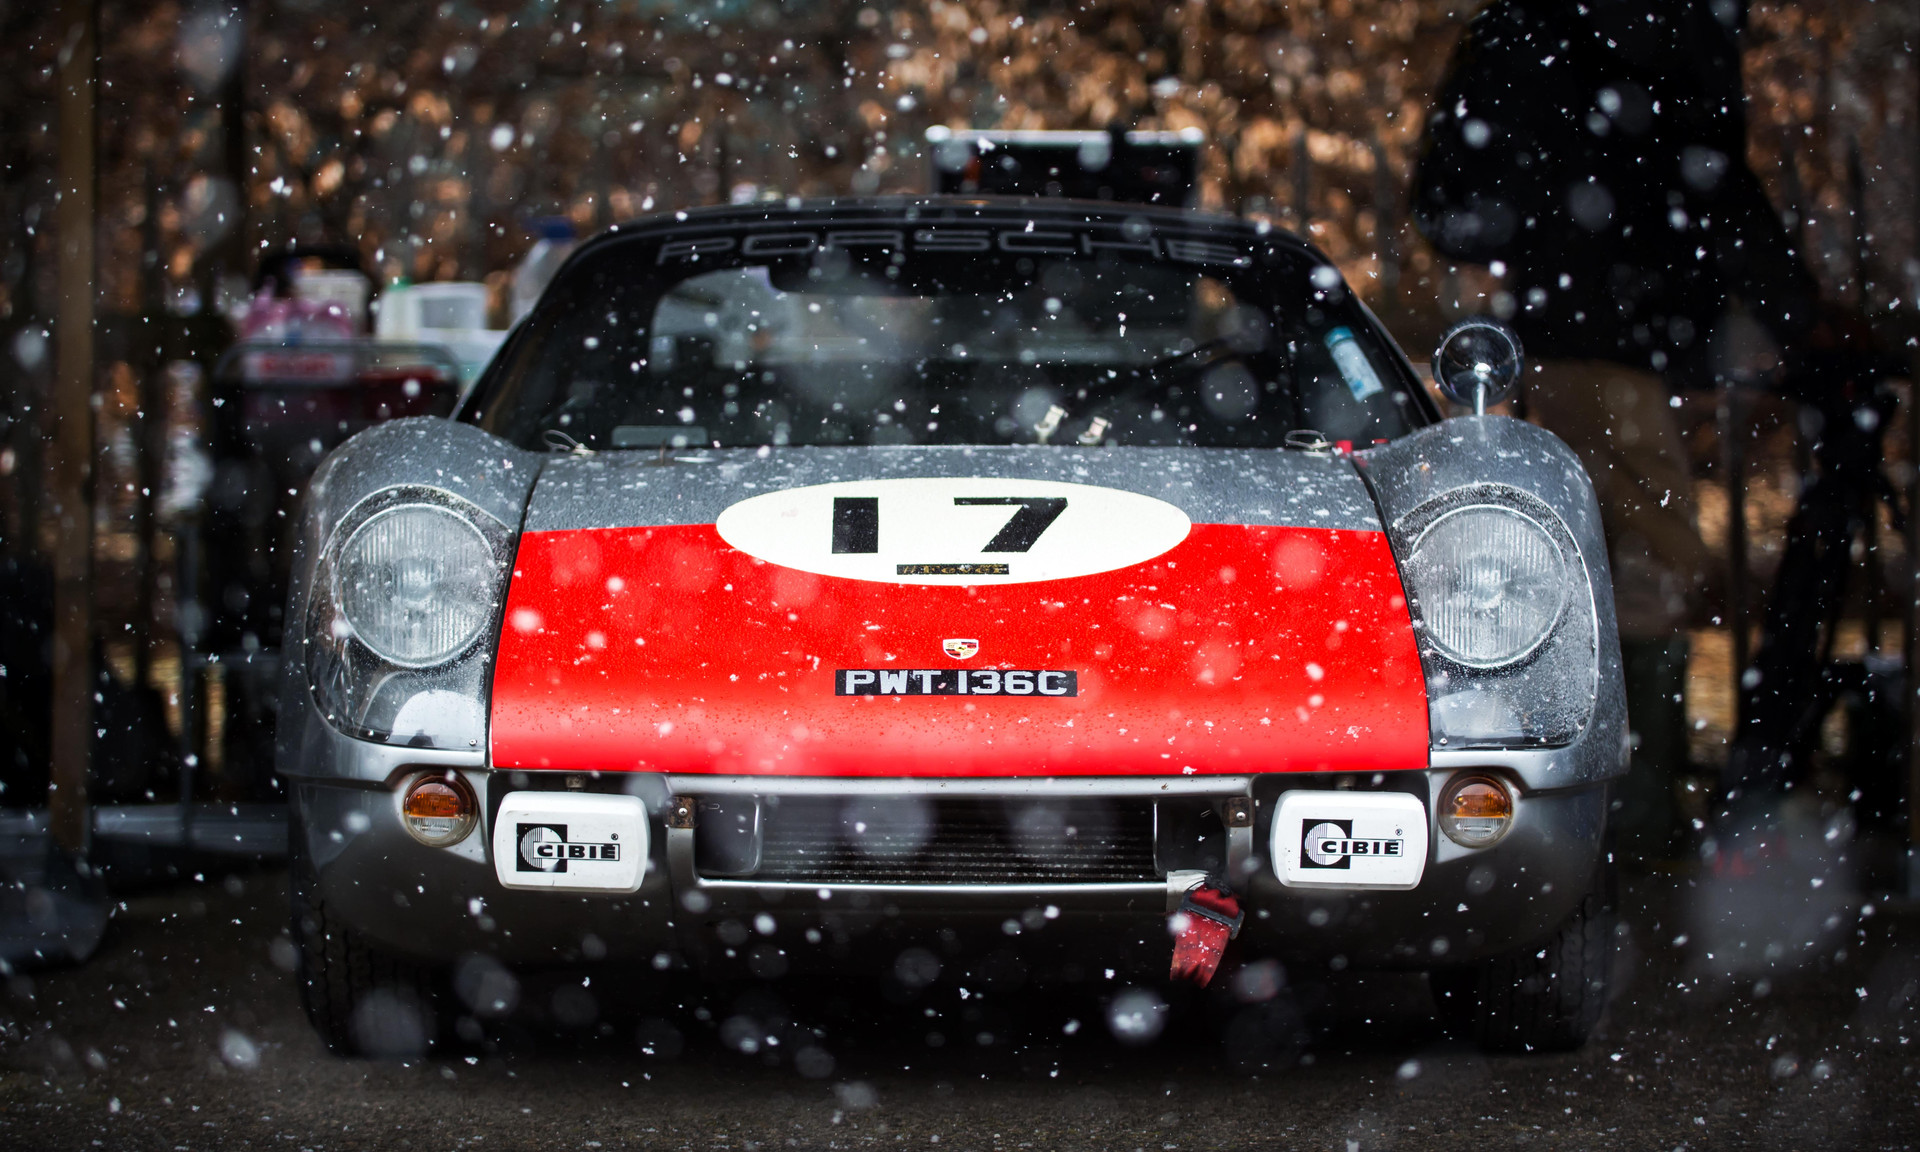 Rudolph. David Clark's 1965 Porsche 904 Carrera GTS at the Goodwood 76MM